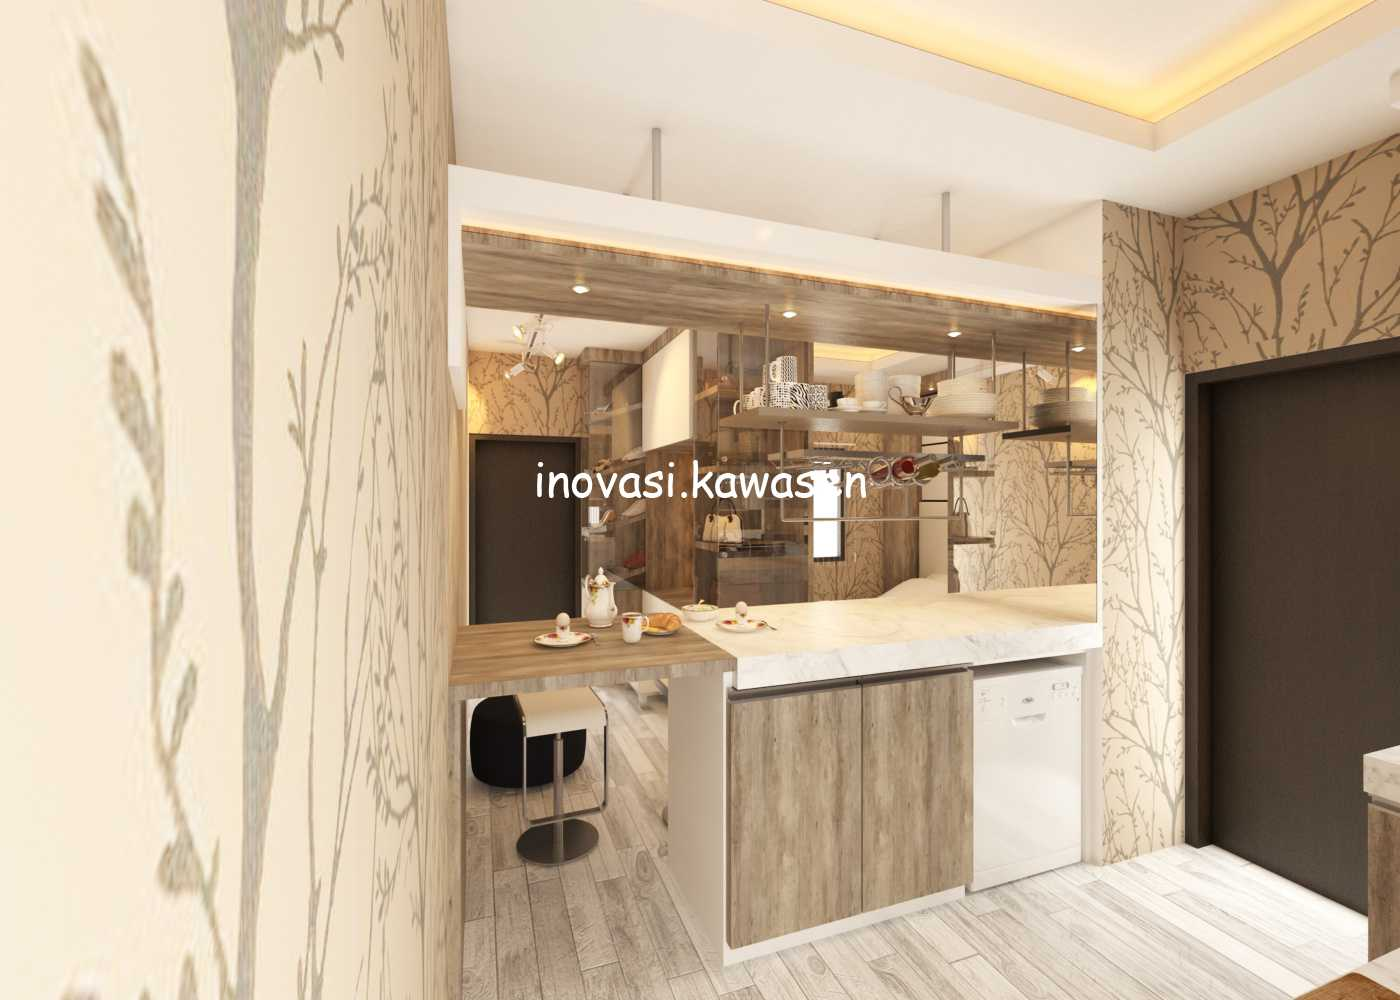 Inovasi Kawasen Interior Apartment Jakarta, Daerah Khusus Ibukota Jakarta, Indonesia Jakarta, Daerah Khusus Ibukota Jakarta, Indonesia Inovasi-Kawasen-Interior-Apartment  89760